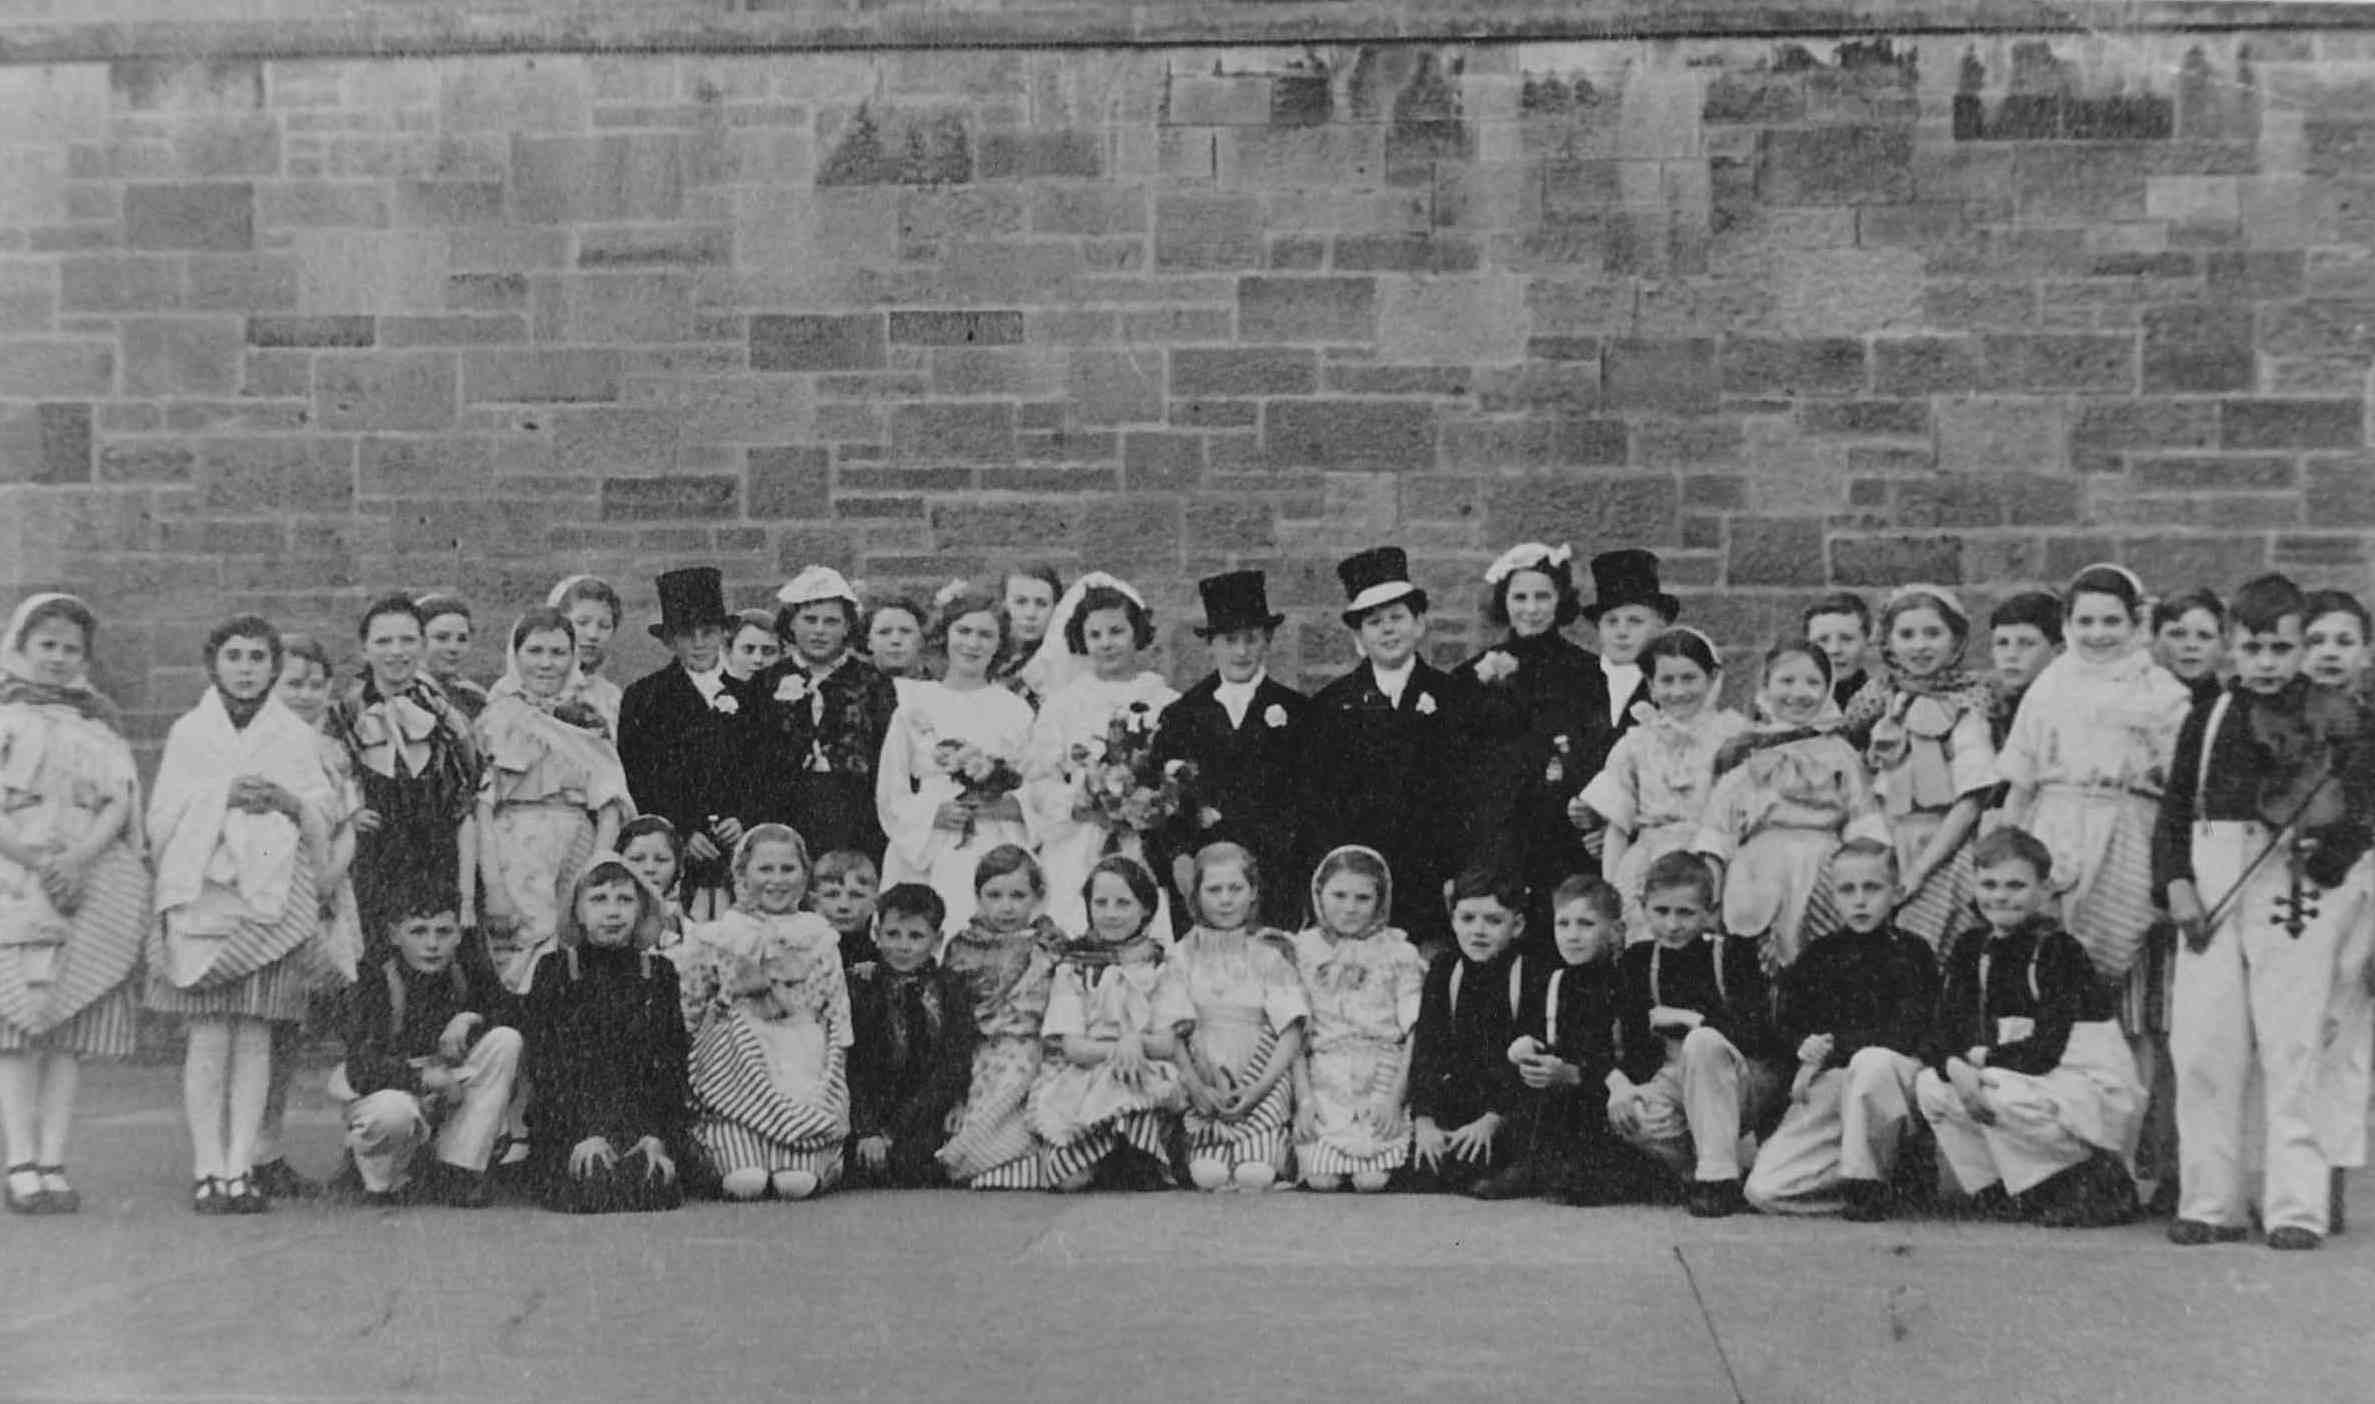 Victoria School Centenary Pagent, Newhaven